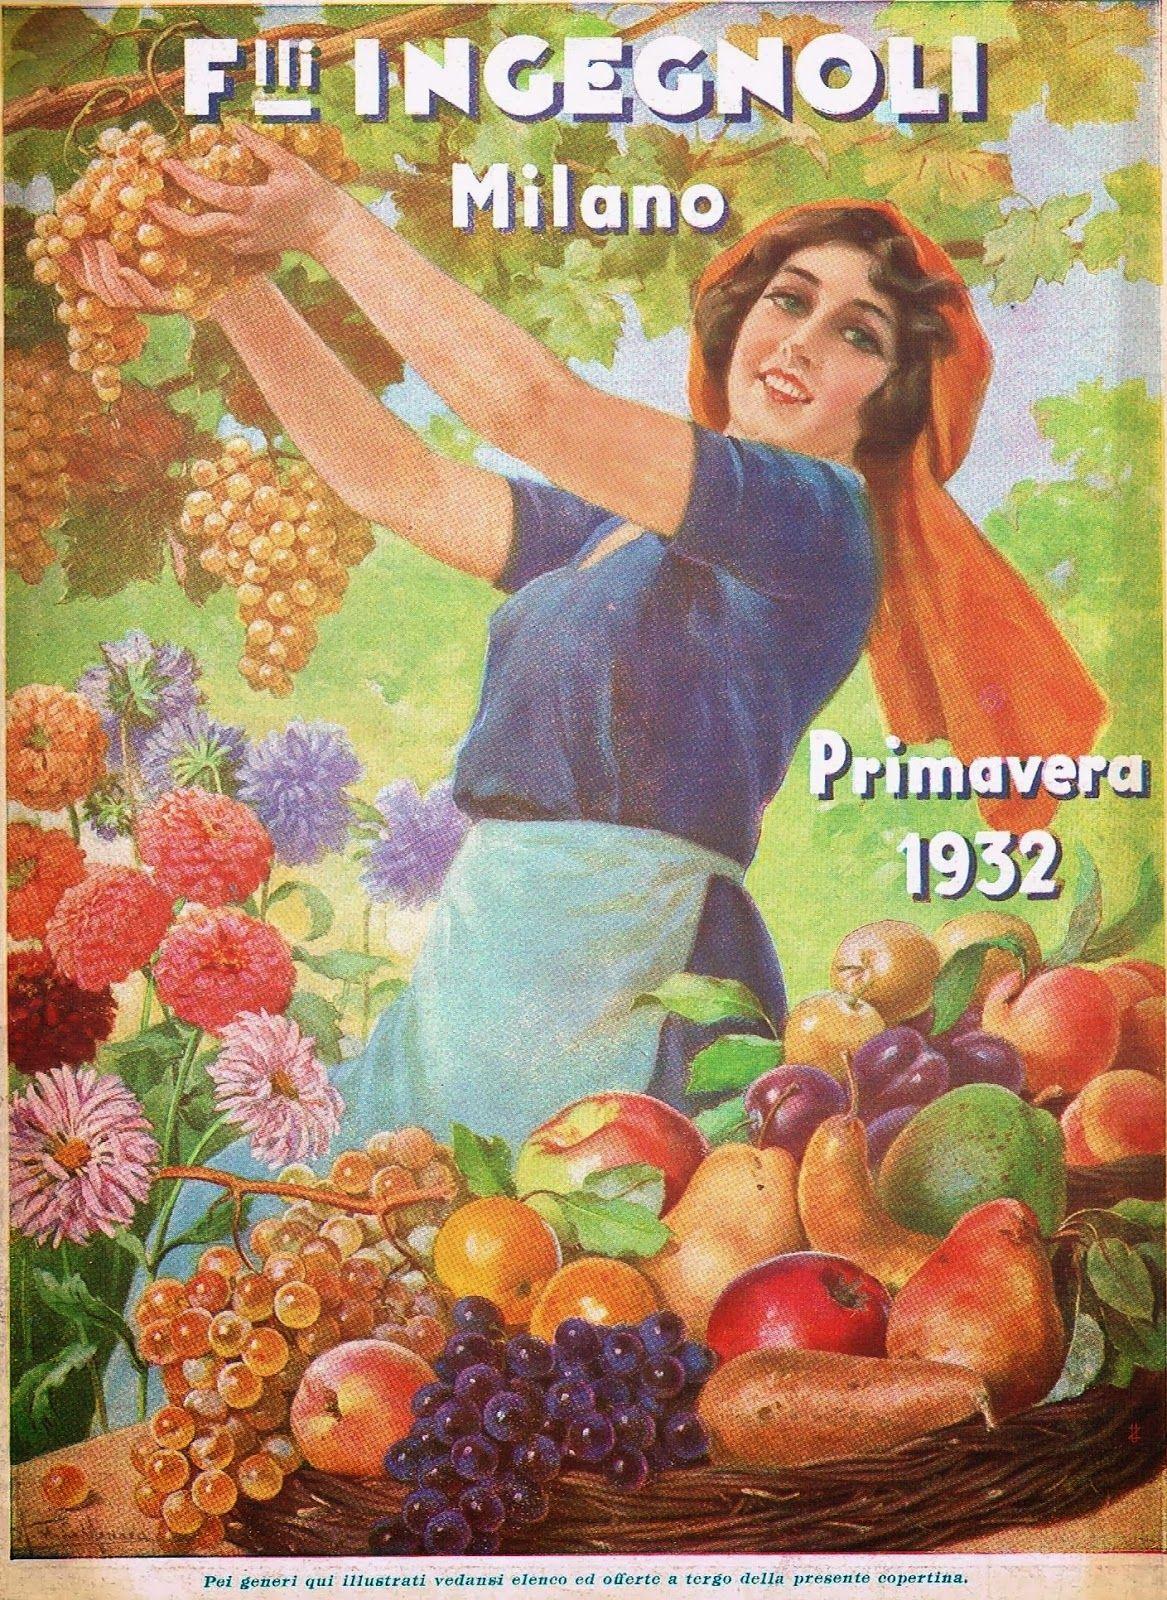 "Portada del catálogo del vivero italiano Flli. Ingegnoli de 1932 ""Primavera 1932"""